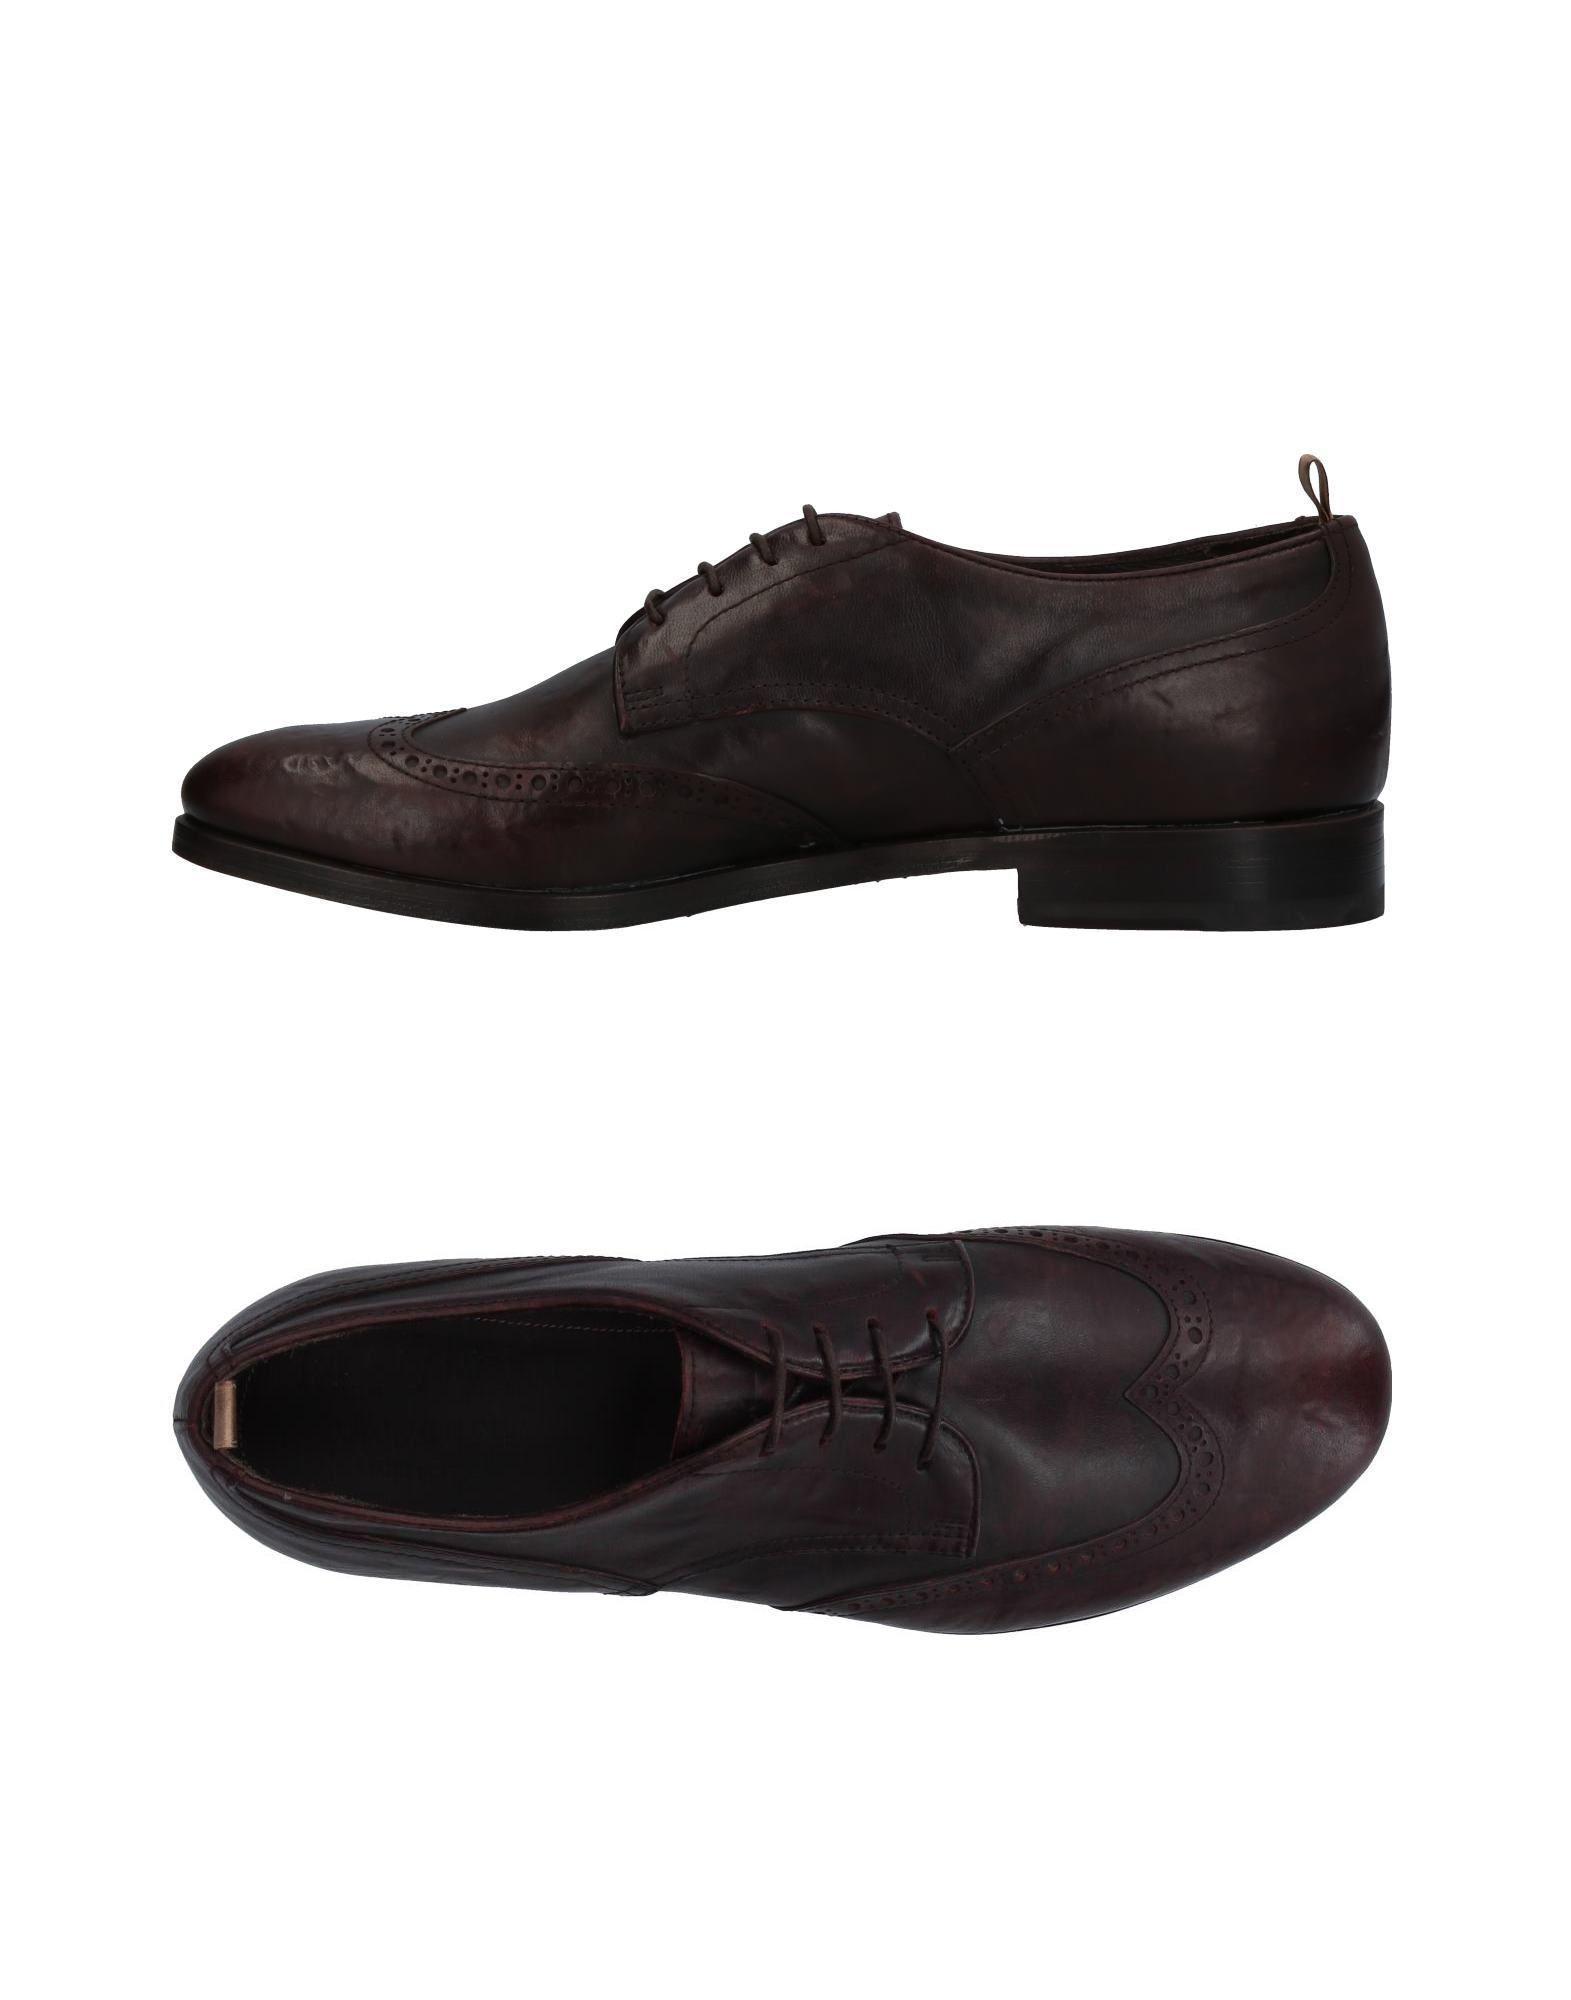 FOOTWEAR - Lace-up shoes Mauron 3izbR0